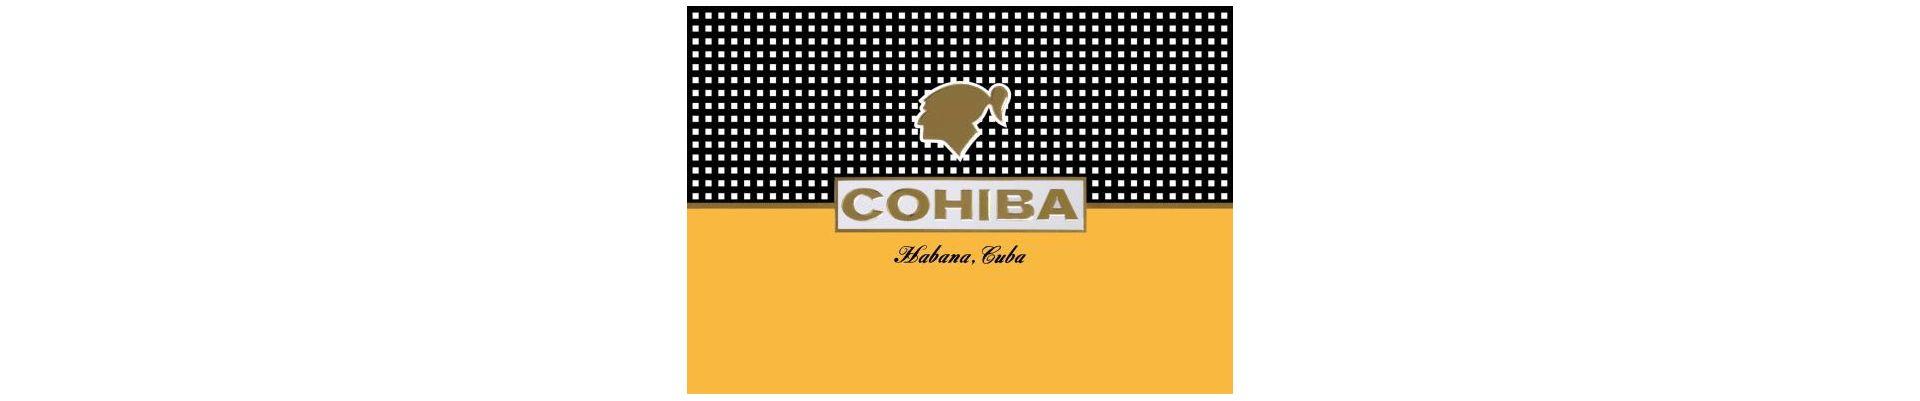 Trabucuri Cohiba Cubaneze trabucuri cubaneze trabuc cubanez cohiba